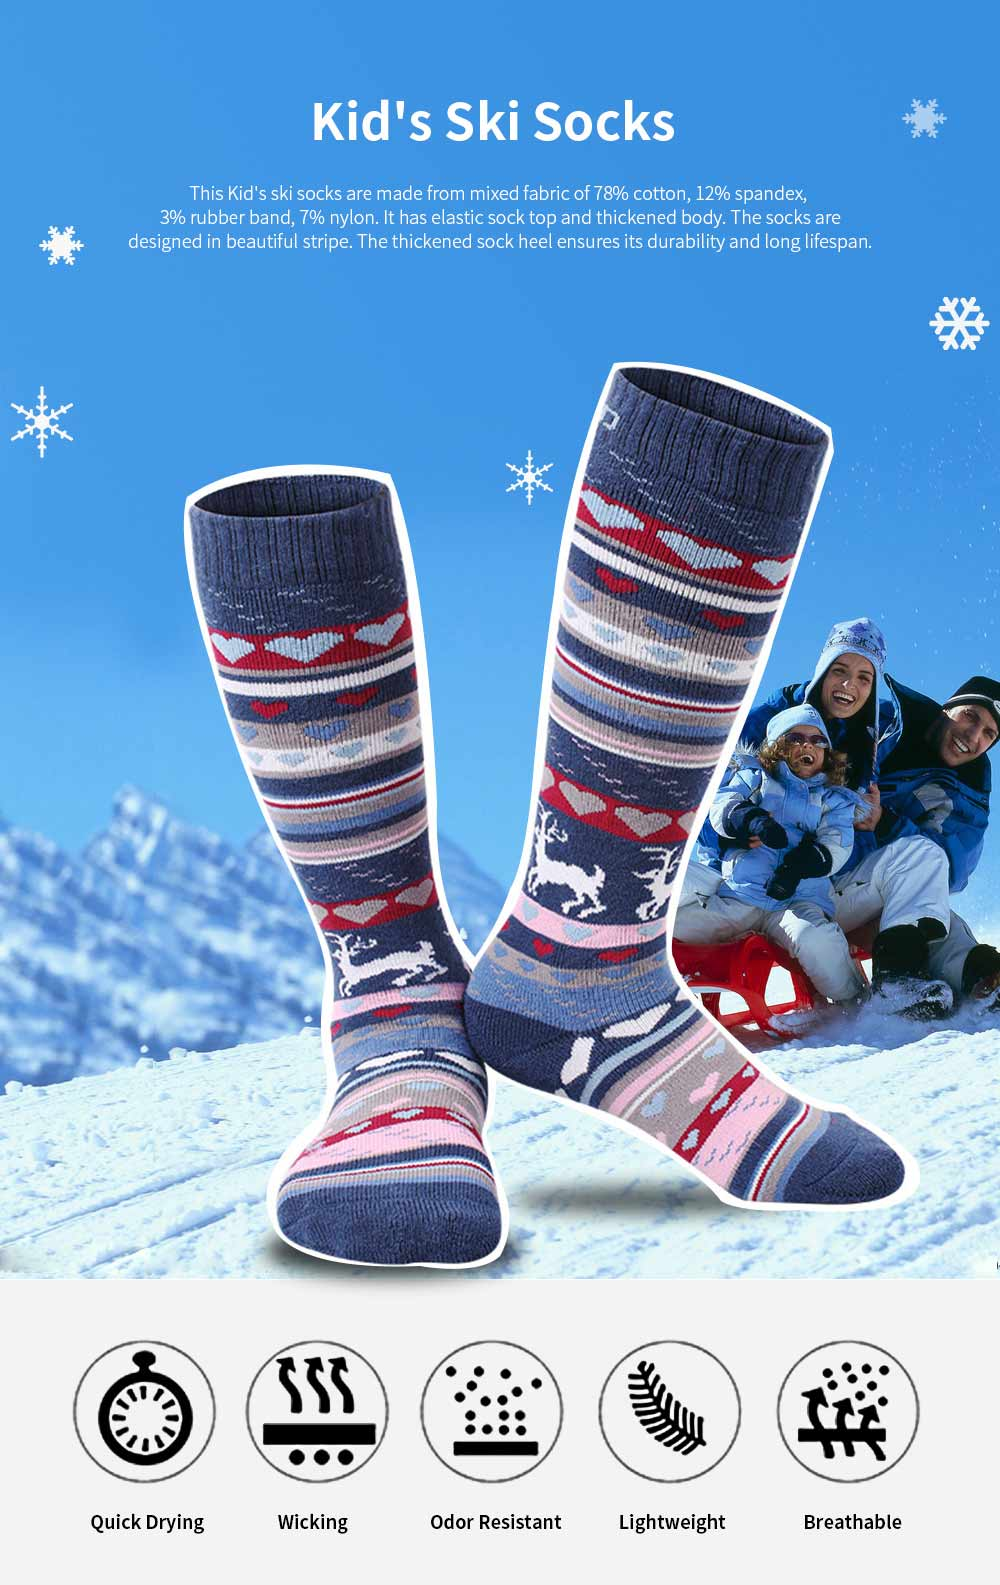 SANTO Ski Socks for Winter Outdoor Activities Thickened Cotton Socks Kids' Lightweight Thermal Socks Odor Resistant Socks 0